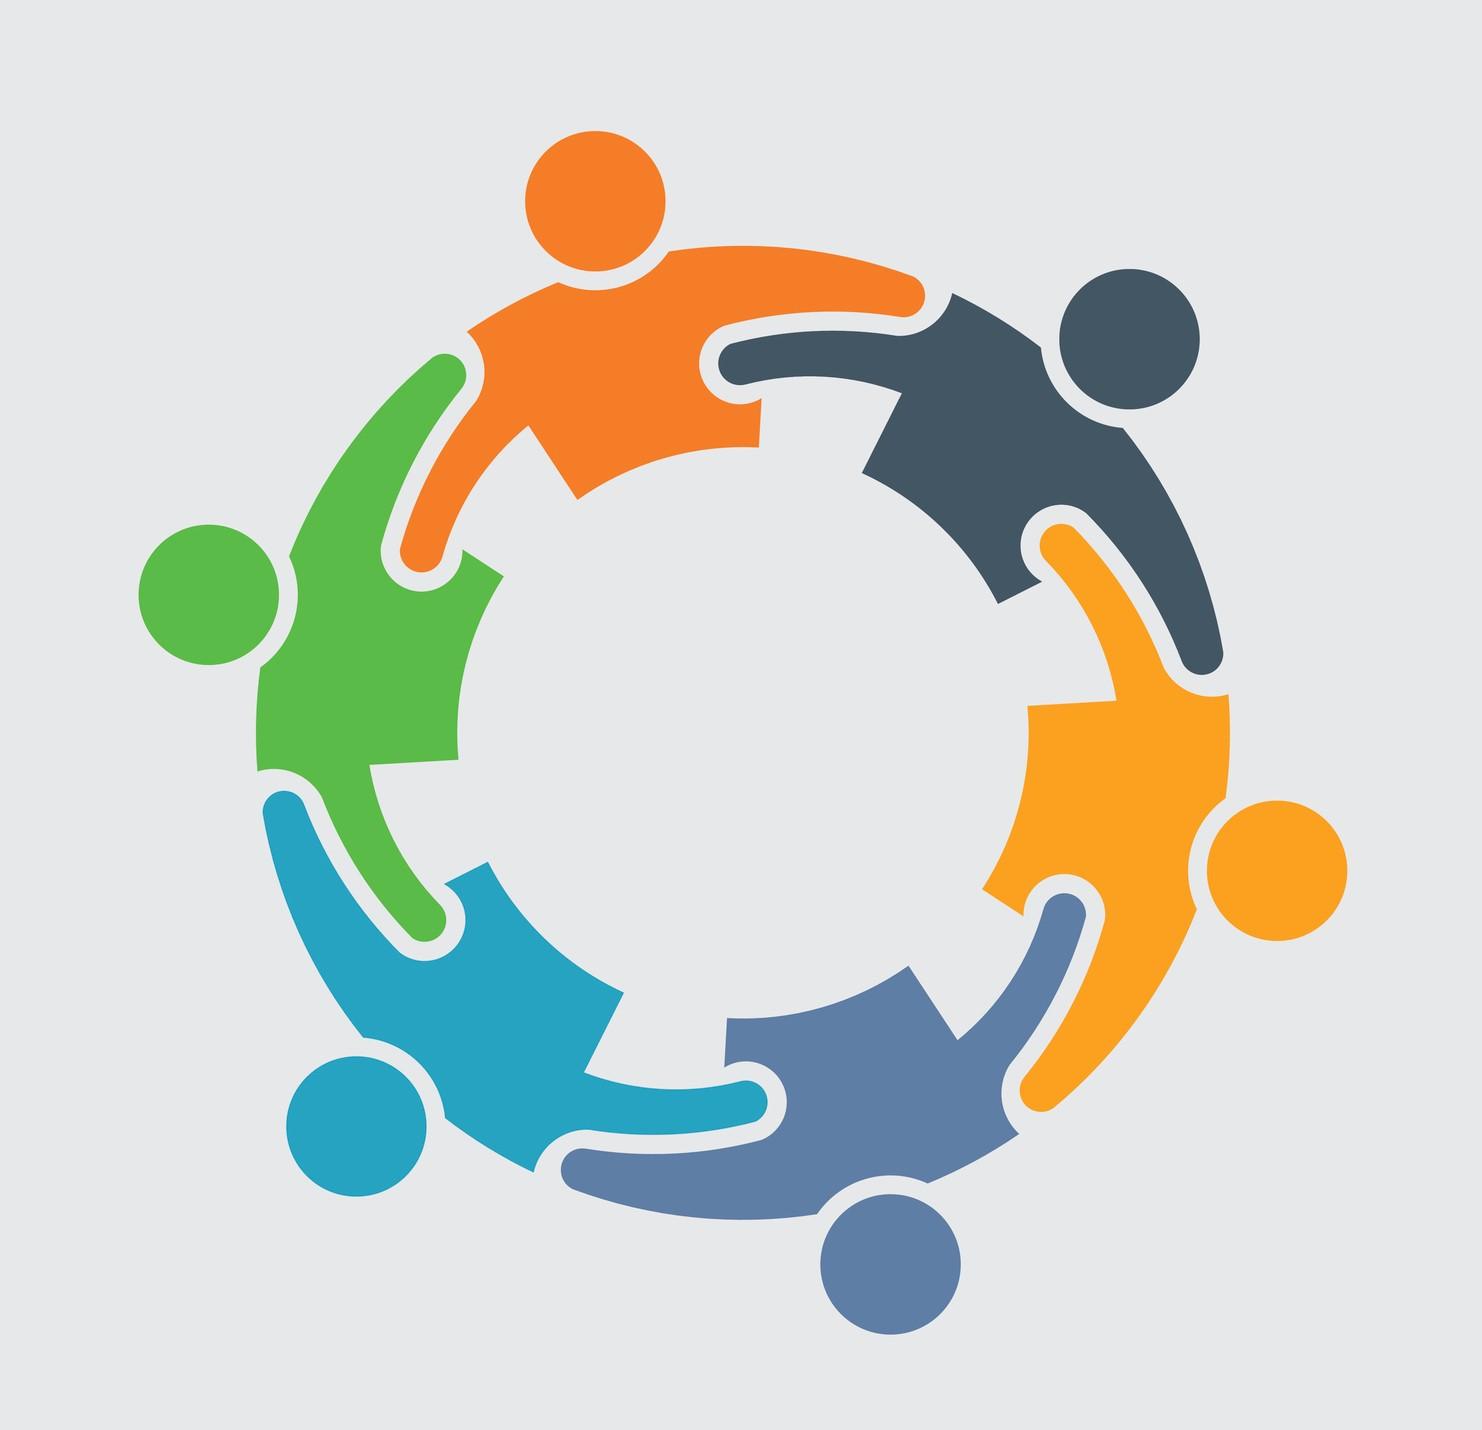 People Family logo.